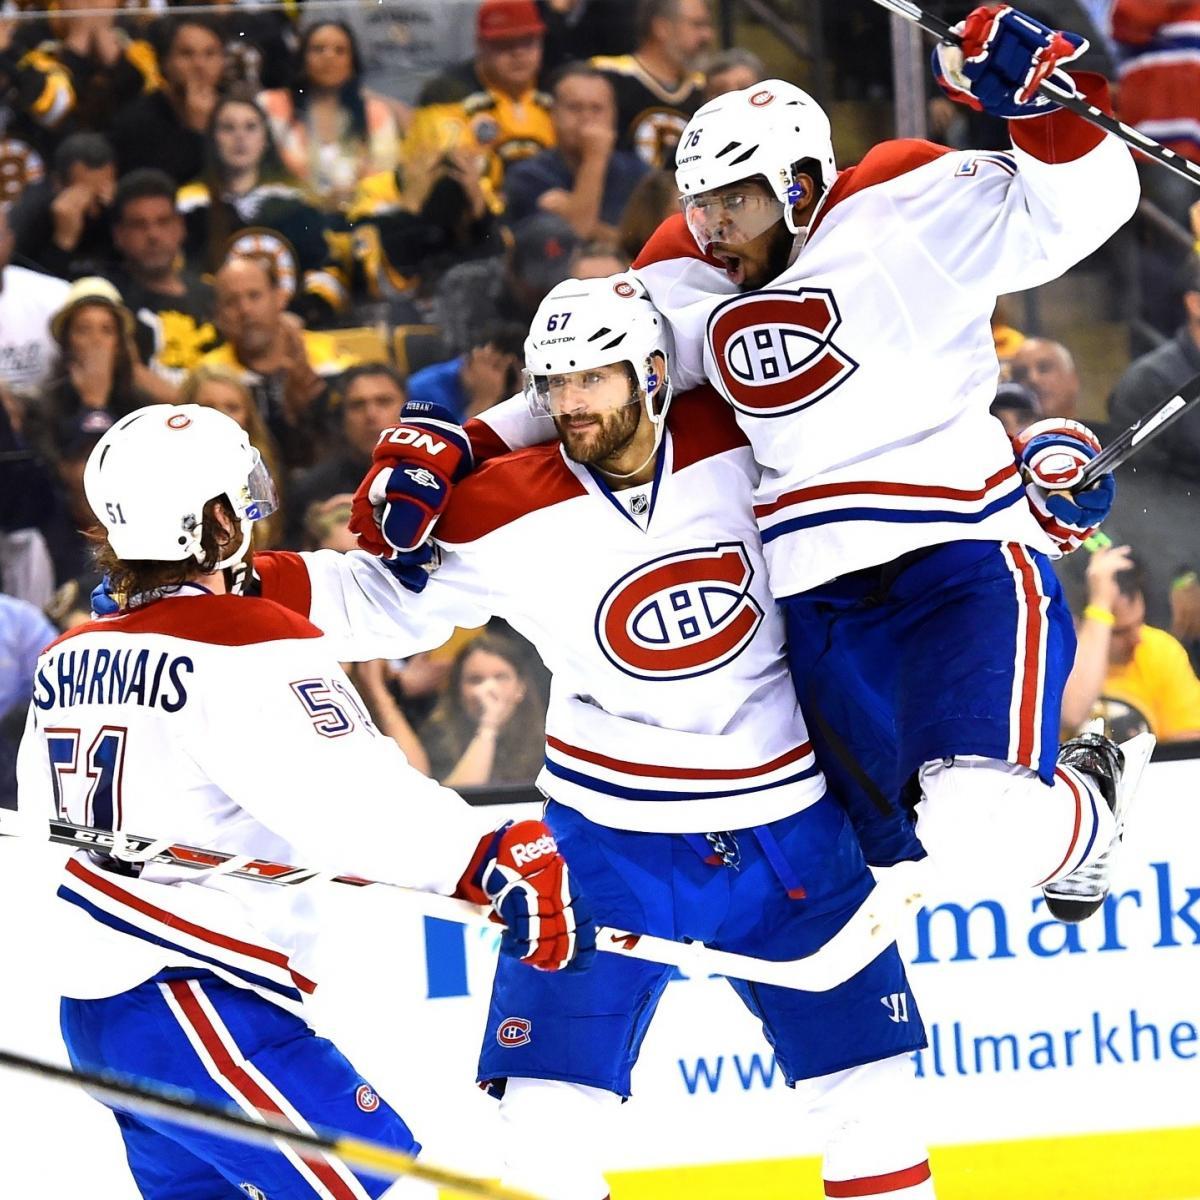 Montreal Canadiens Vs. Boston Bruins Game 7: Live Score